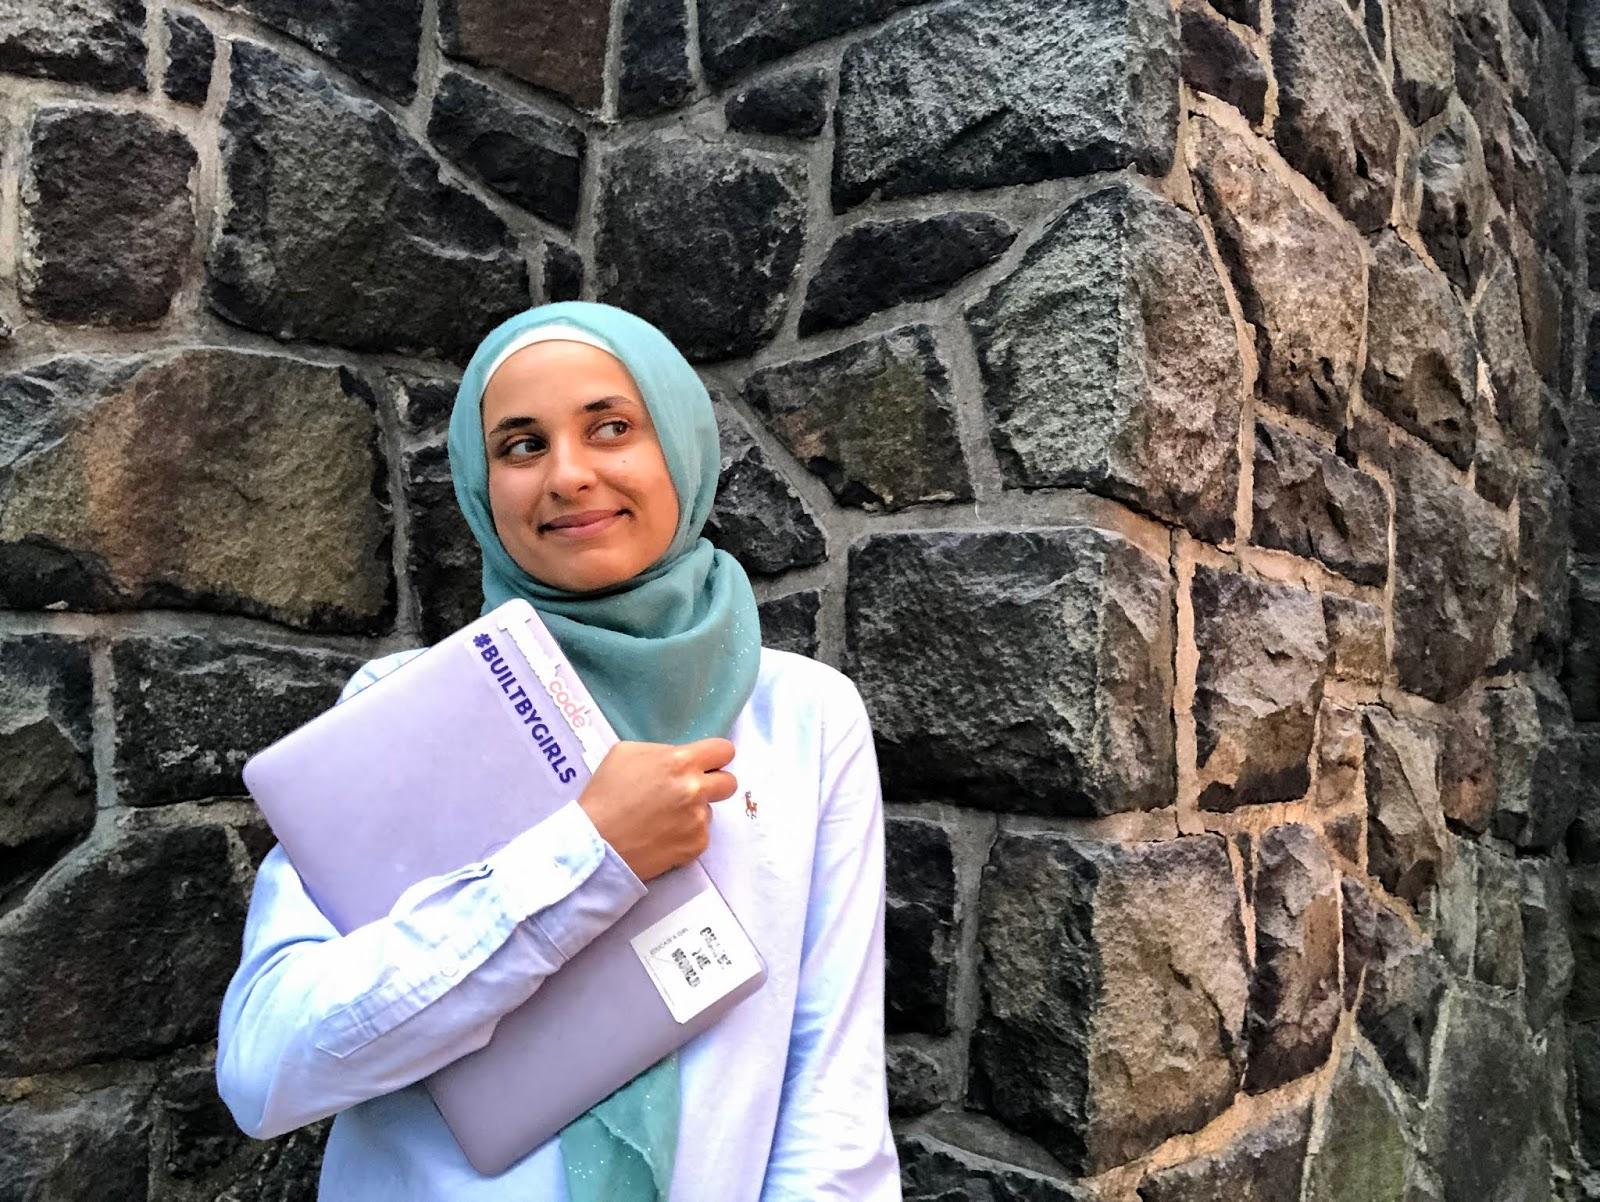 sahara holding laptop